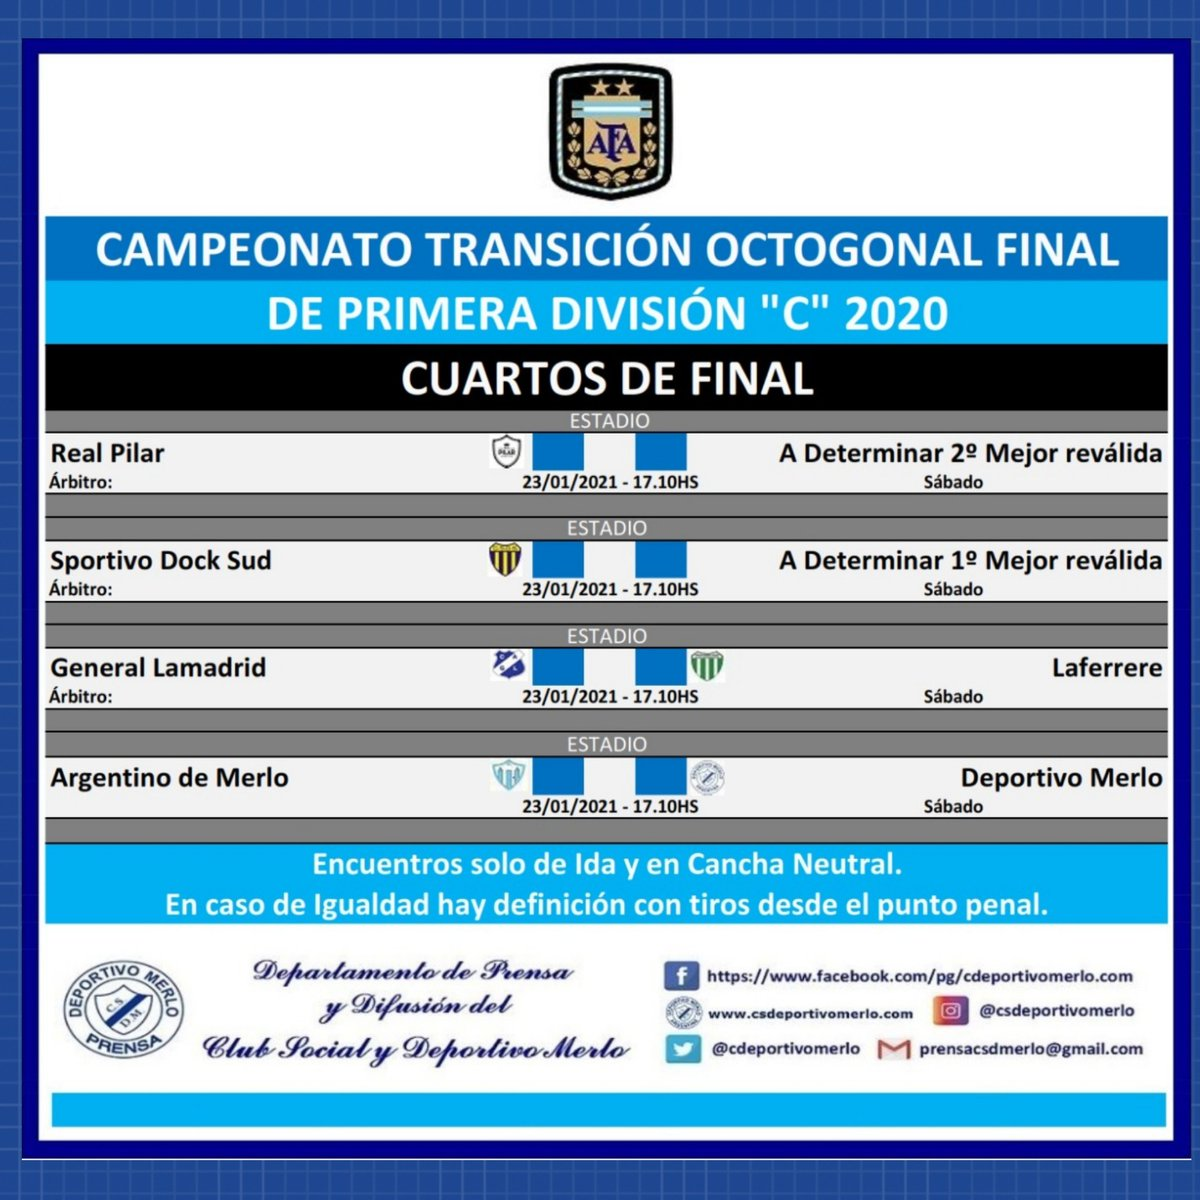 CS y Deportivo Merlo 🇫🇮 (Desde 🏠) on Twitter: